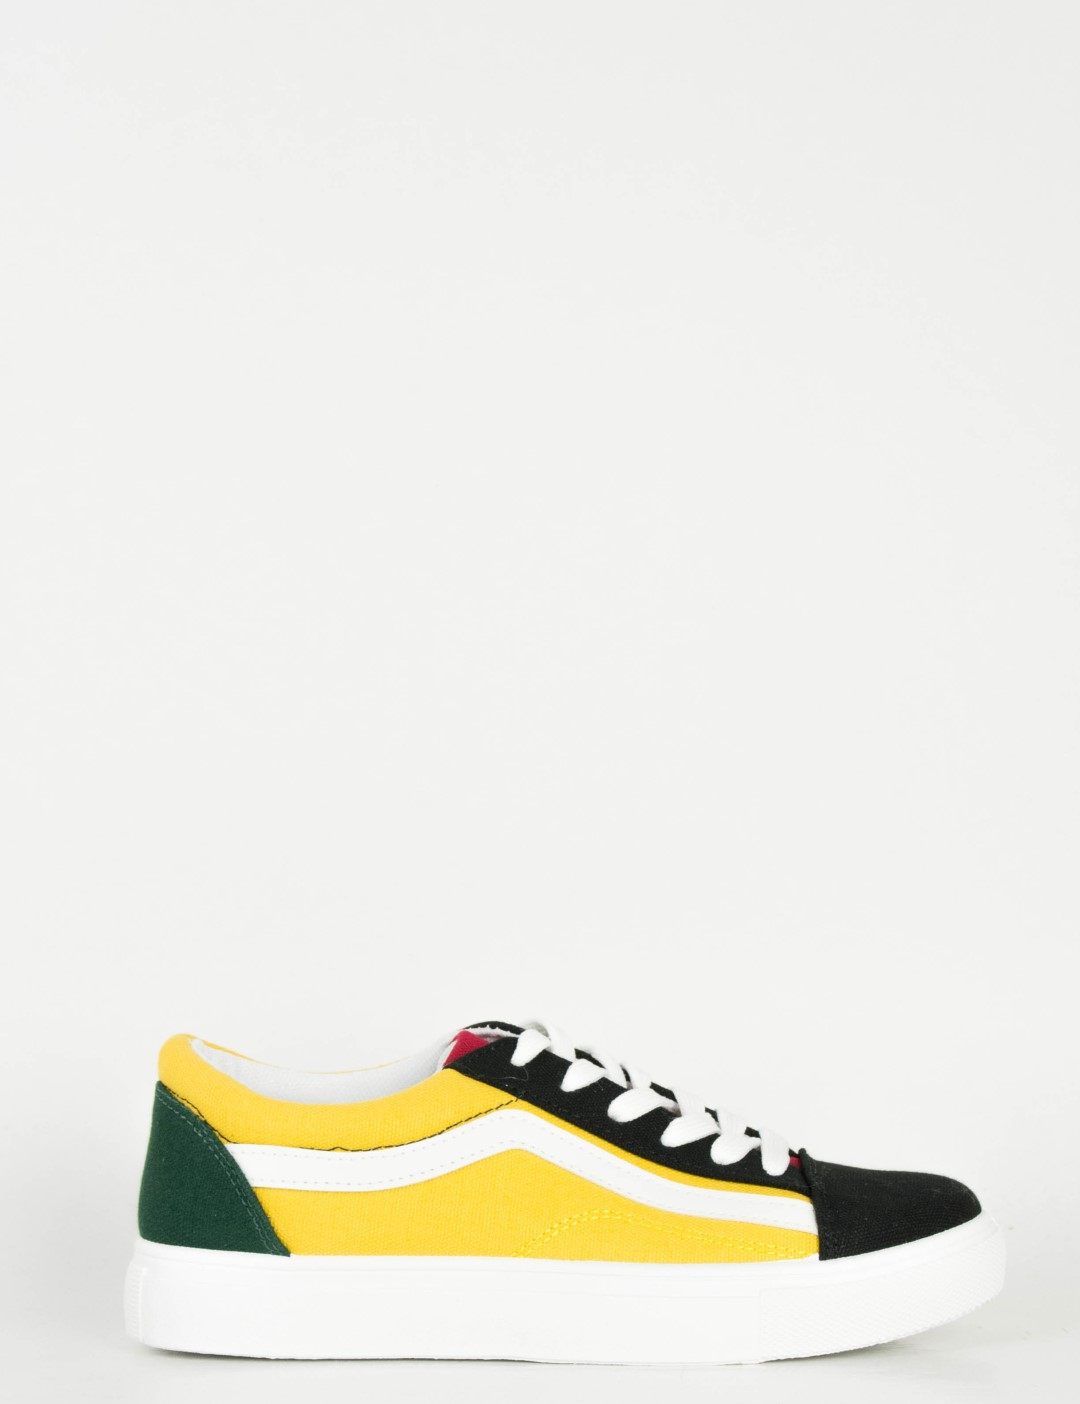 e25c3c9925d ΓΥΝΑΙΚΑ ΓΥΝΑΙΚΕΙΑ ΠΑΠΟΥΤΣΙΑ ΠΑΠΟΥΤΣΙΑ Sneakers Casual | 2 | priceAsc